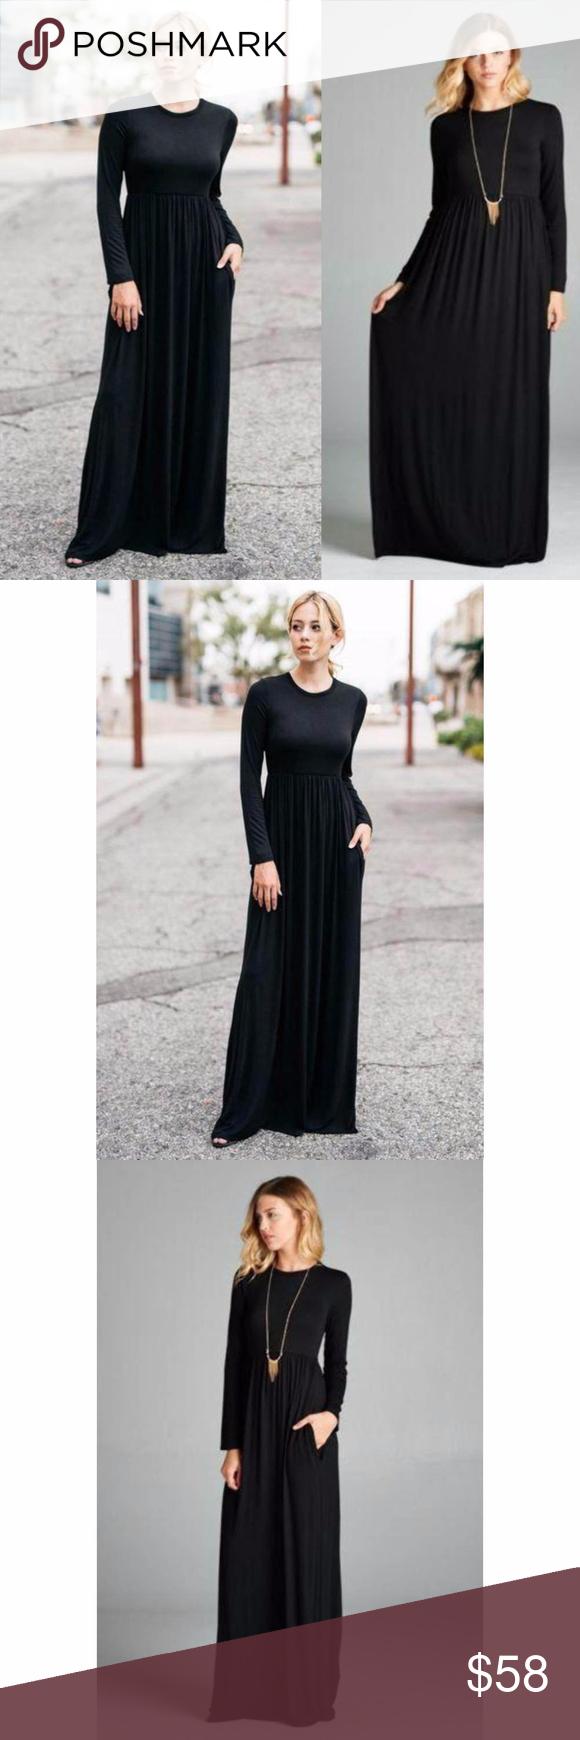 Long sleeve flowy high waist maxi dress